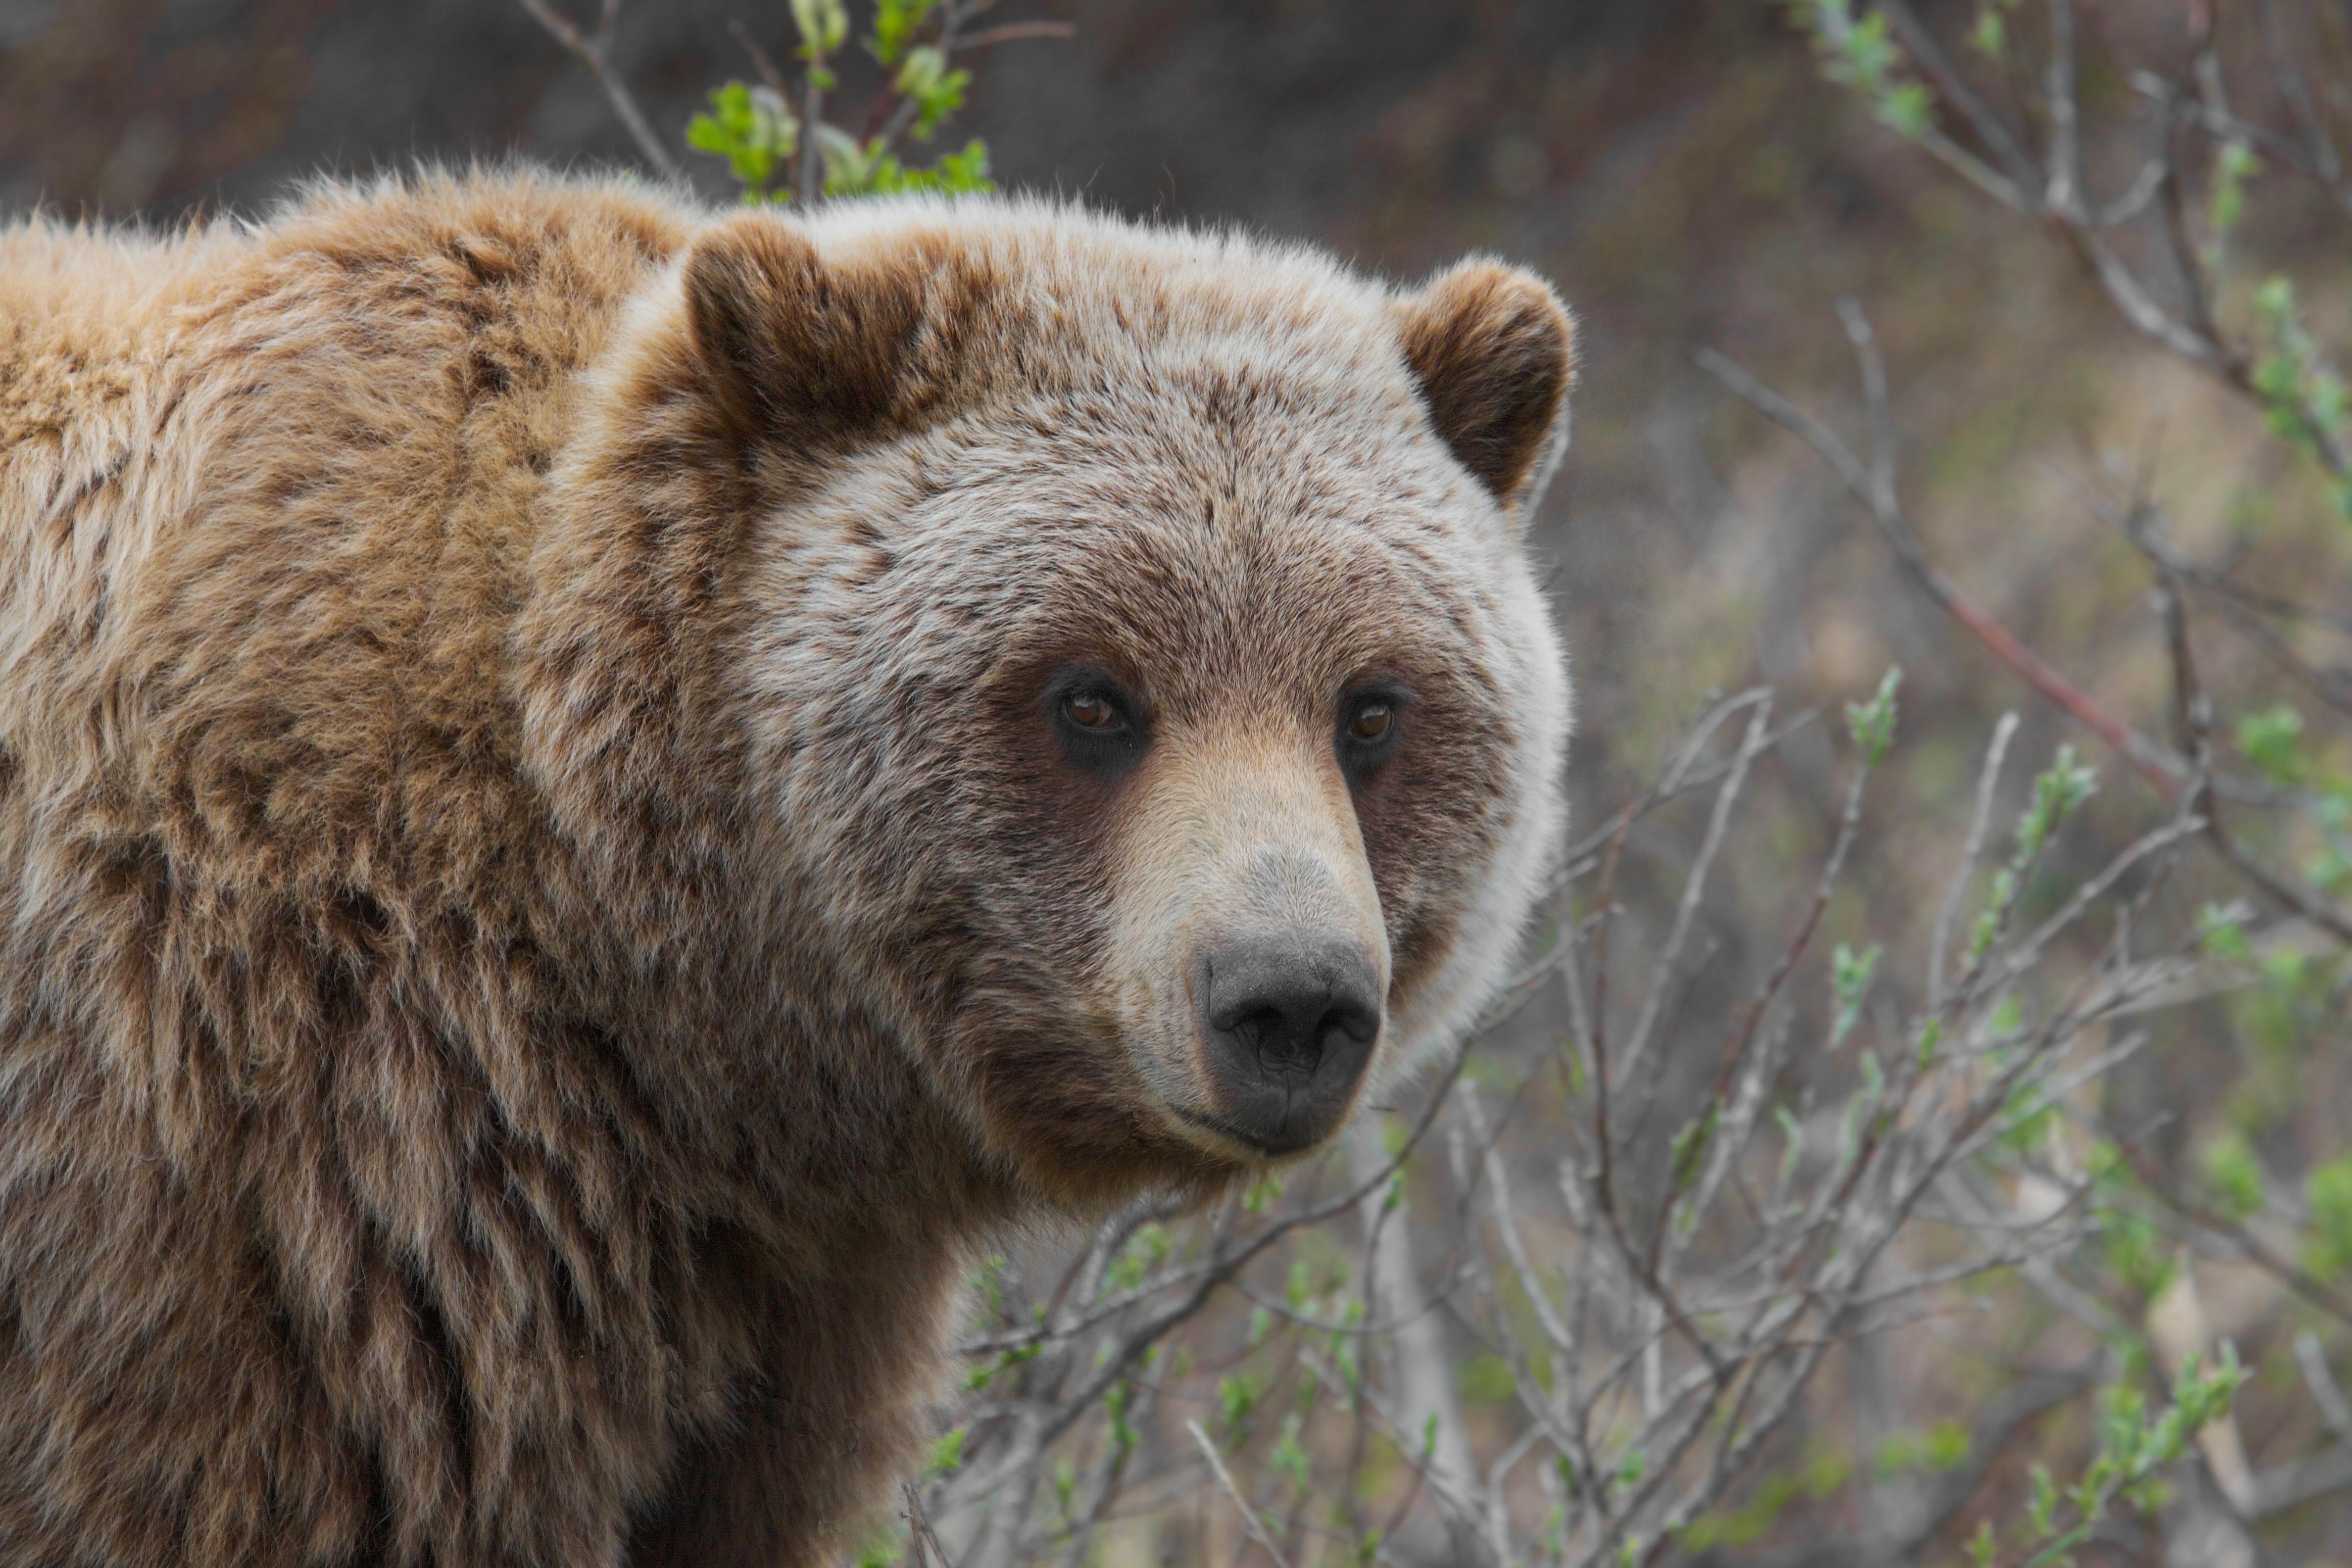 Grizzly_Bear_(Ursus_arctos_ssp.).jpg